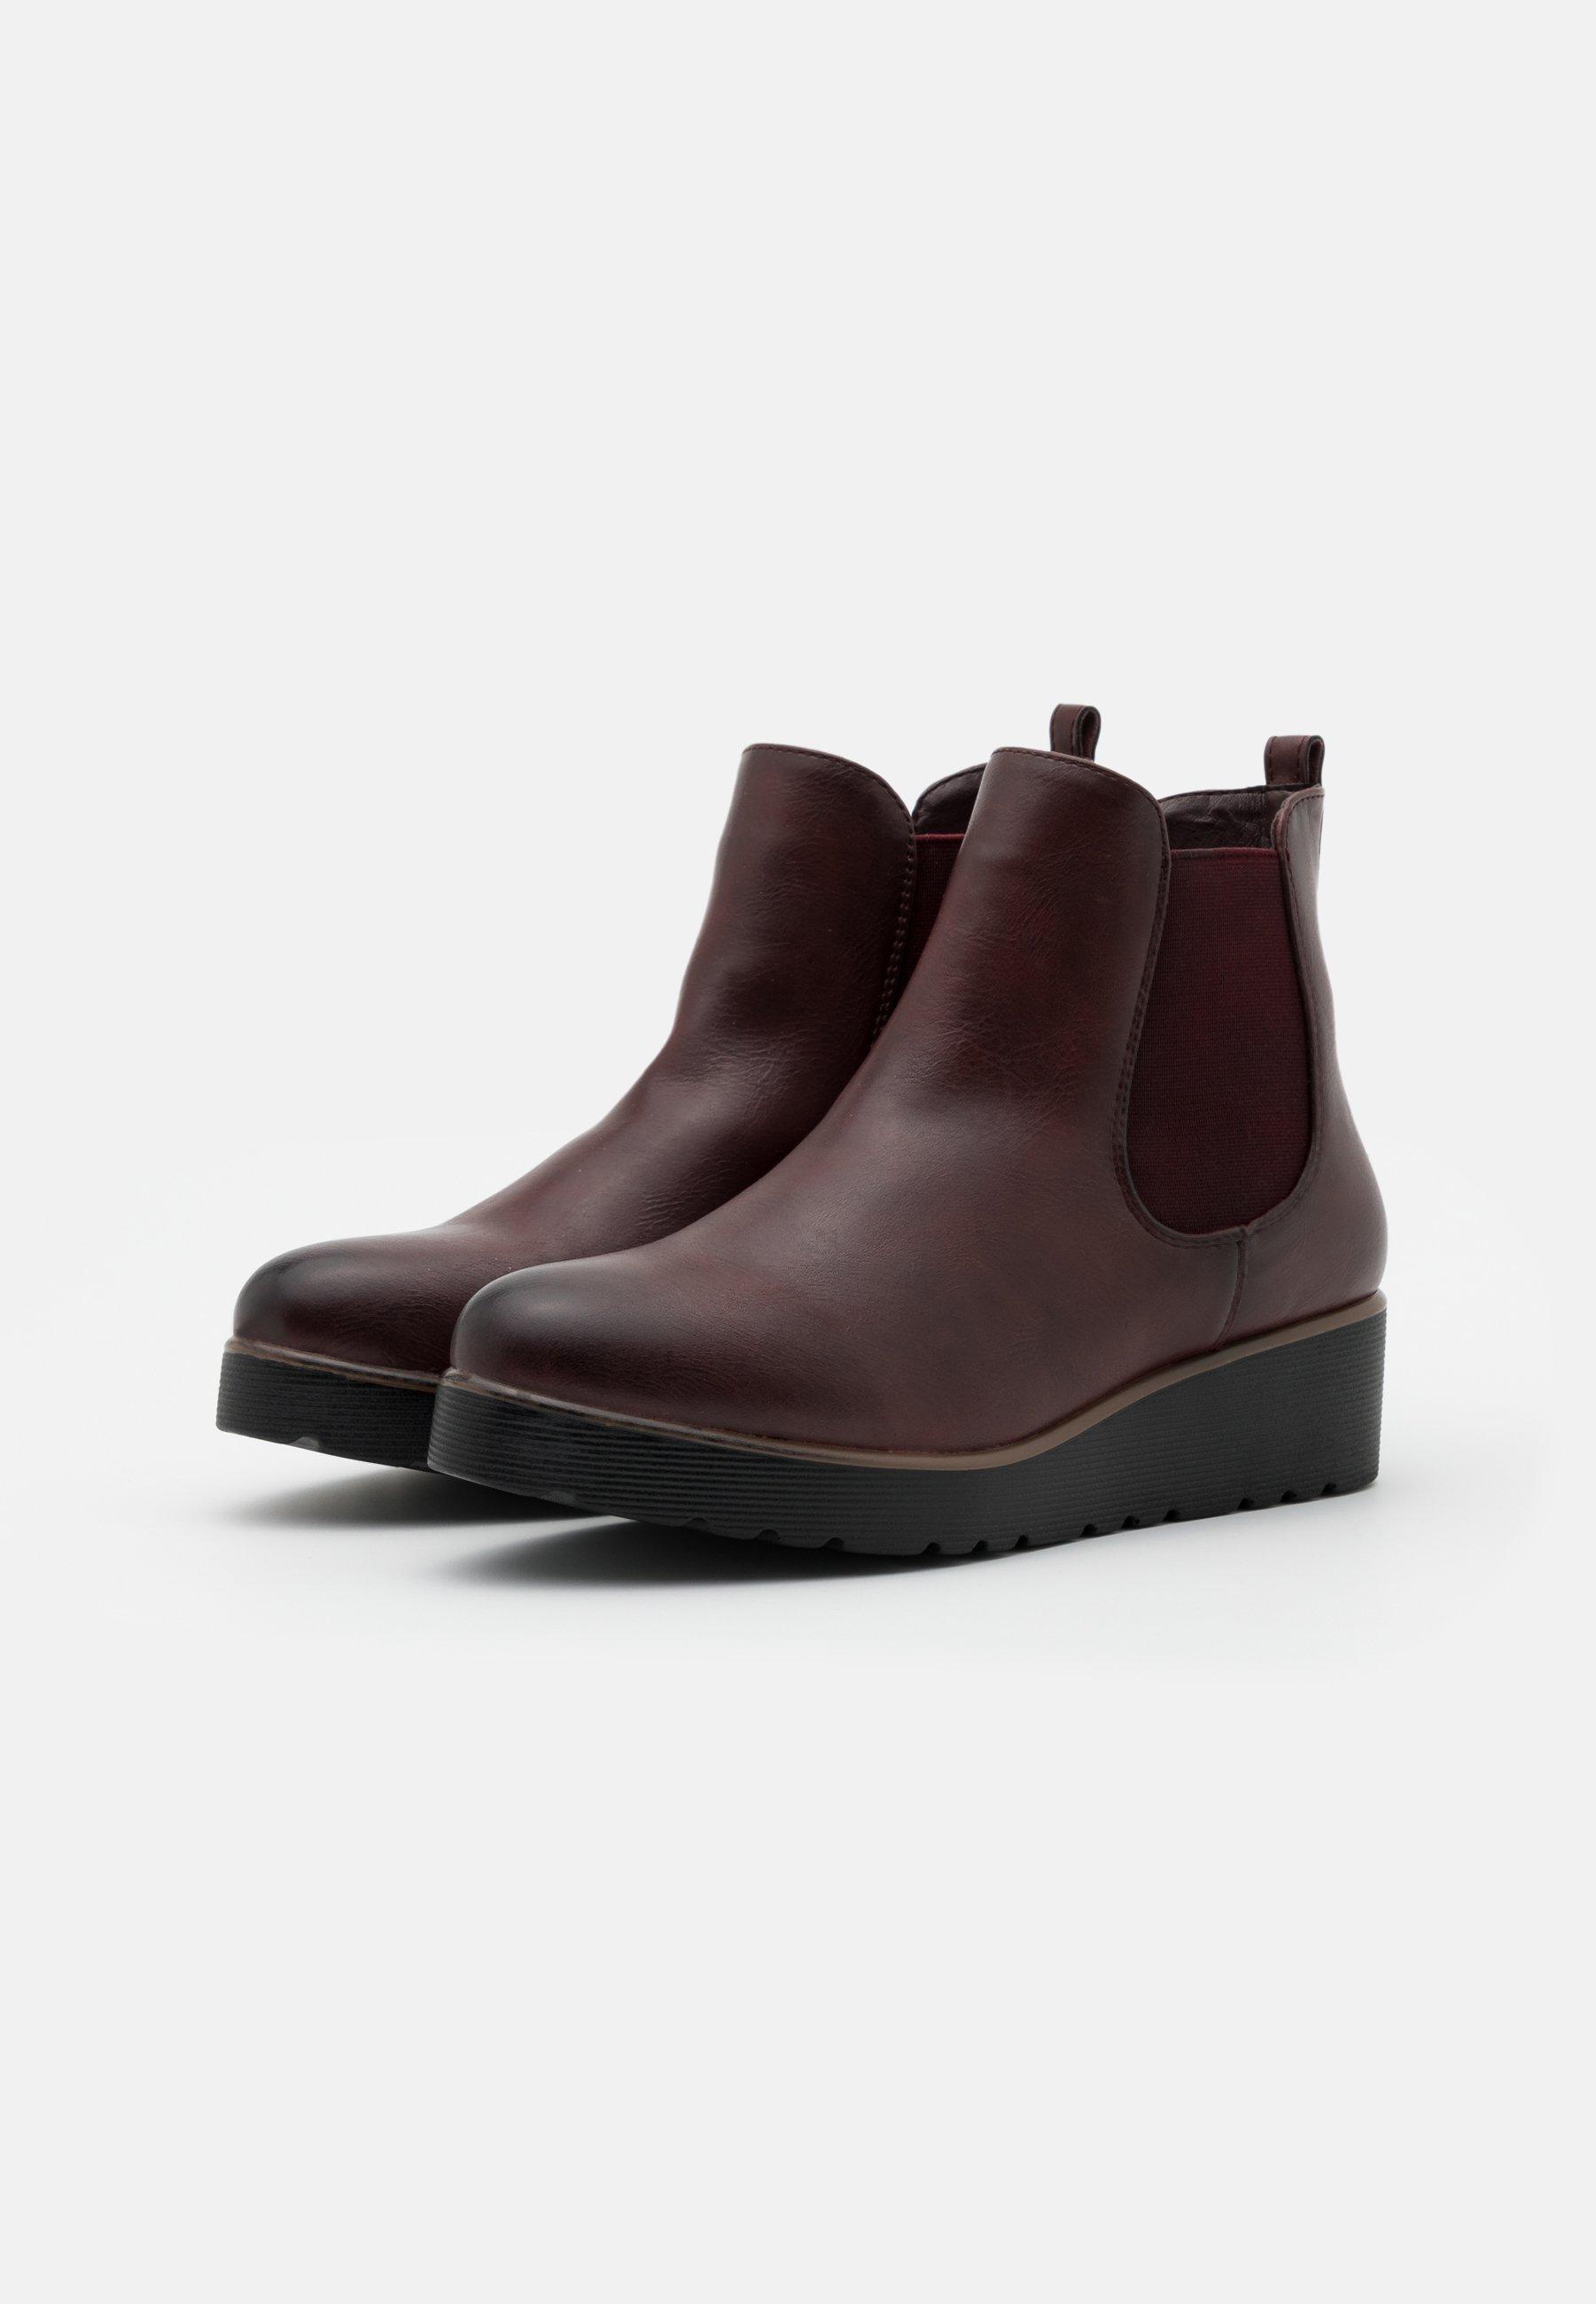 Anna Field Nilkkurit - dark red - Naisten kengät K58Lf